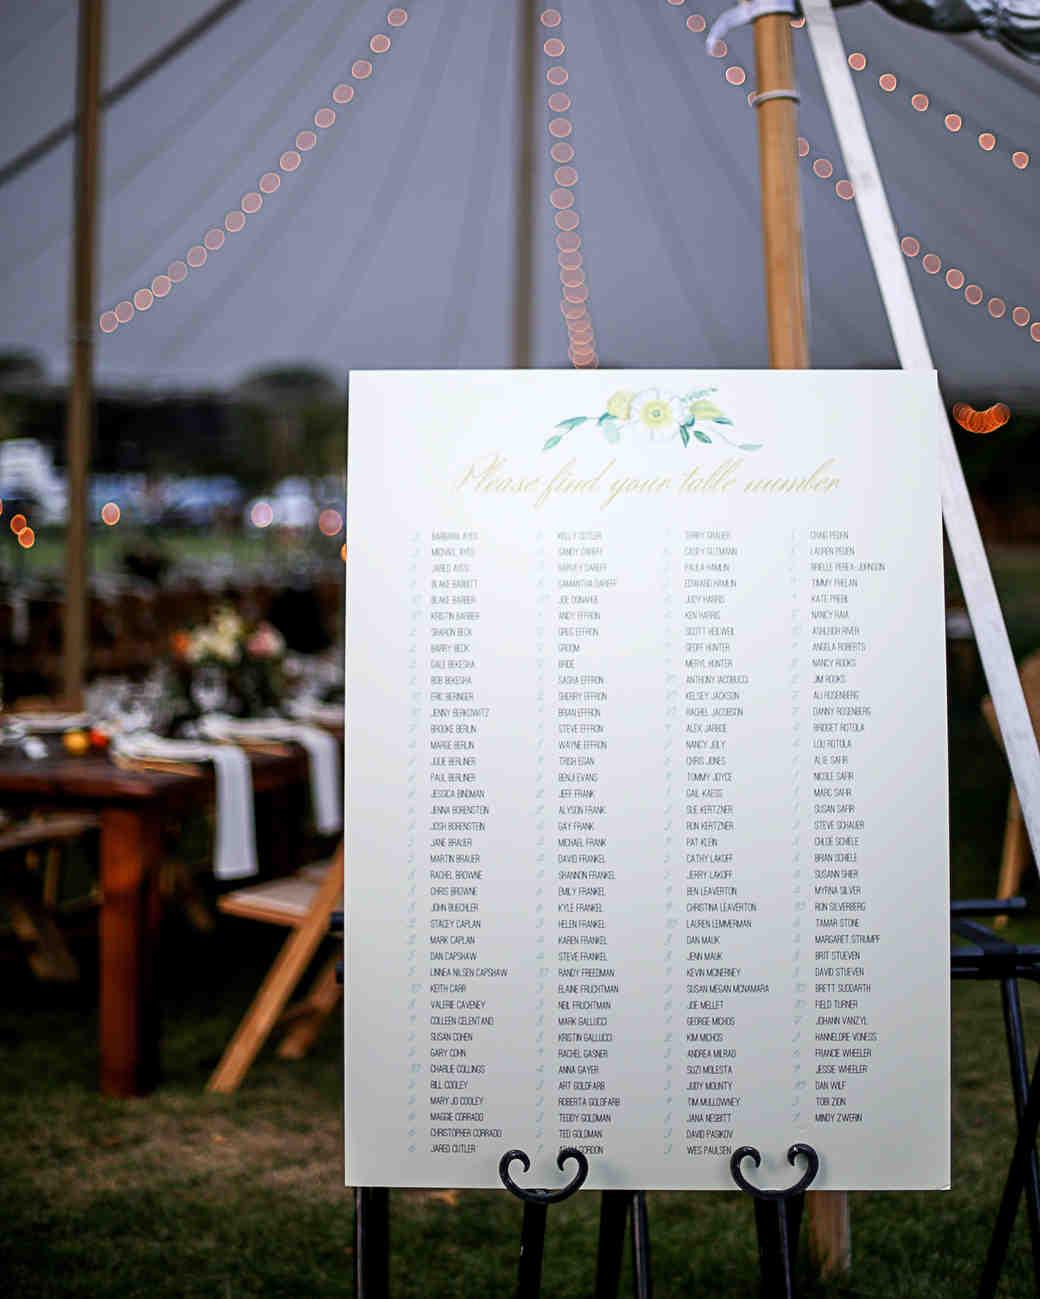 lana danny wedding seatingchart 325 s111831 0315_vert?itok=LJpVfMGC how to plan a wedding in 9 months martha stewart weddings